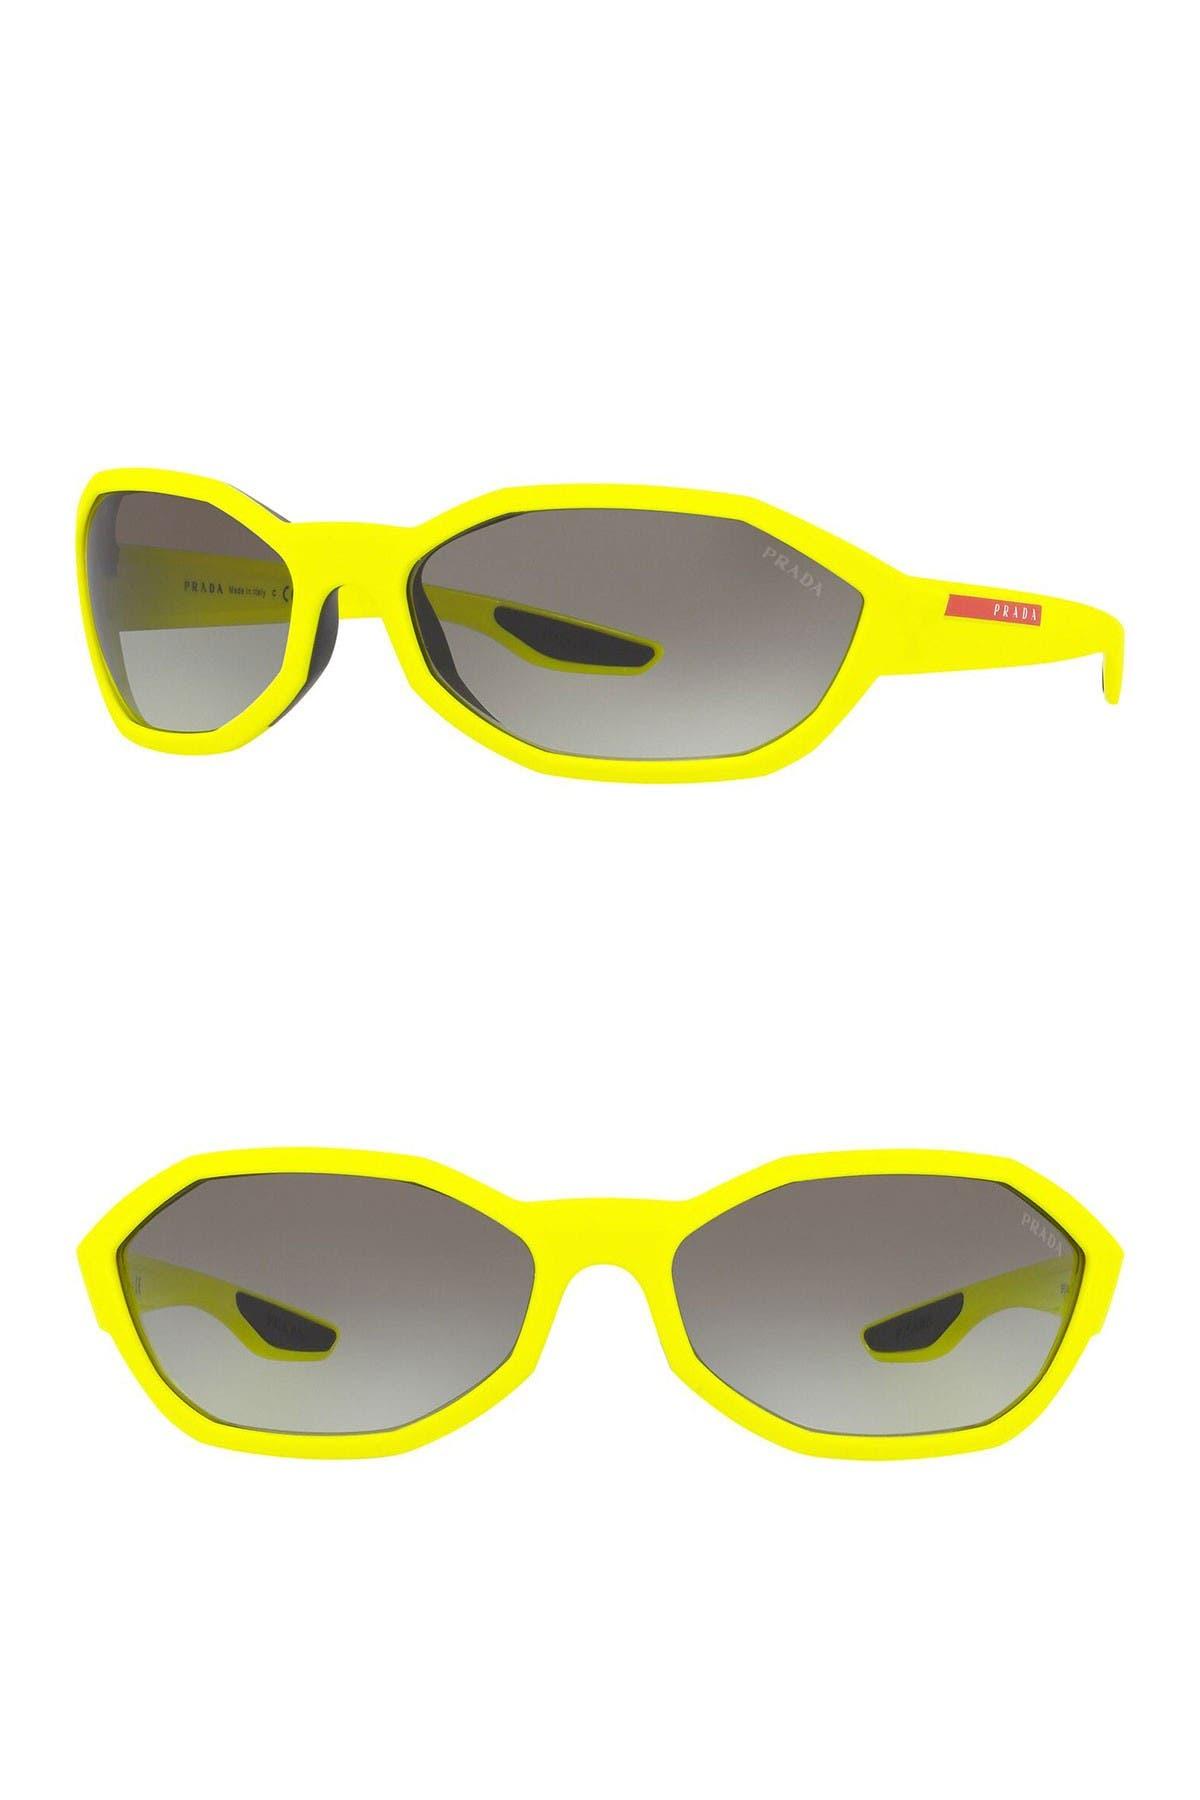 Image of PRADA LINEA ROSSA Grad 67mm Irregular Sunglasses